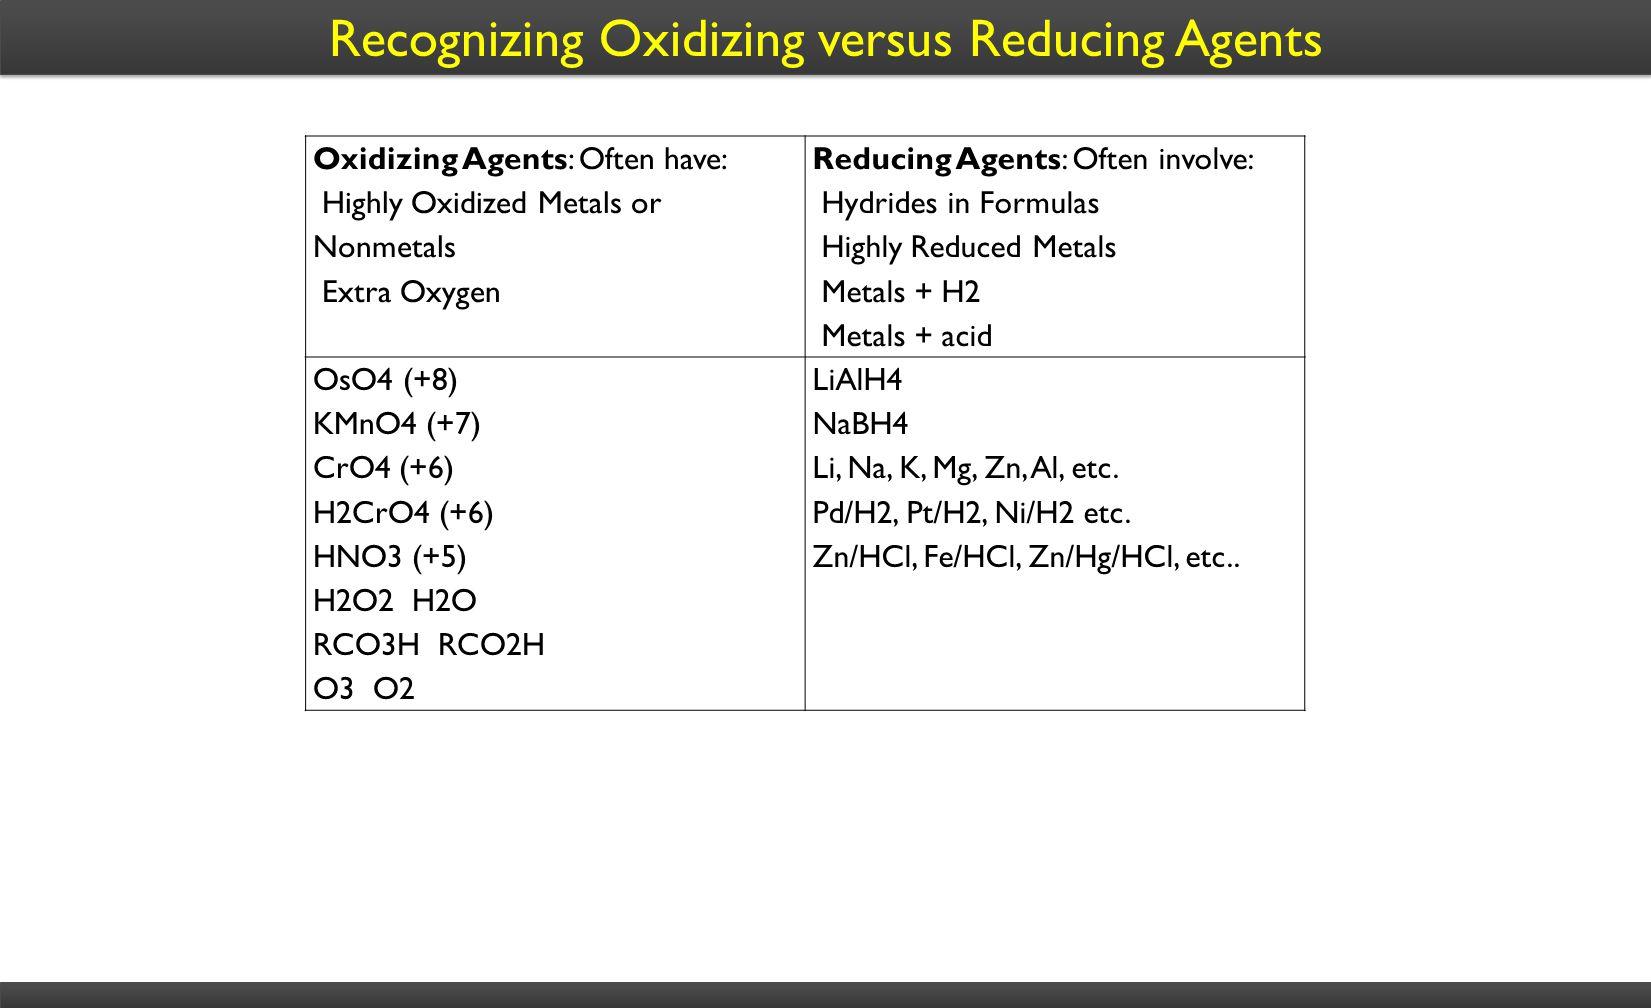 Recognizing Oxidizing versus Reducing Agents Oxidizing Agents: Often have: Highly Oxidized Metals or Nonmetals Extra Oxygen Reducing Agents: Often involve: Hydrides in Formulas Highly Reduced Metals Metals + H2 Metals + acid OsO4 (+8) KMnO4 (+7) CrO4 (+6) H2CrO4 (+6) HNO3 (+5) H2O2 H2O RCO3H RCO2H O3 O2 LiAlH4 NaBH4 Li, Na, K, Mg, Zn, Al, etc.